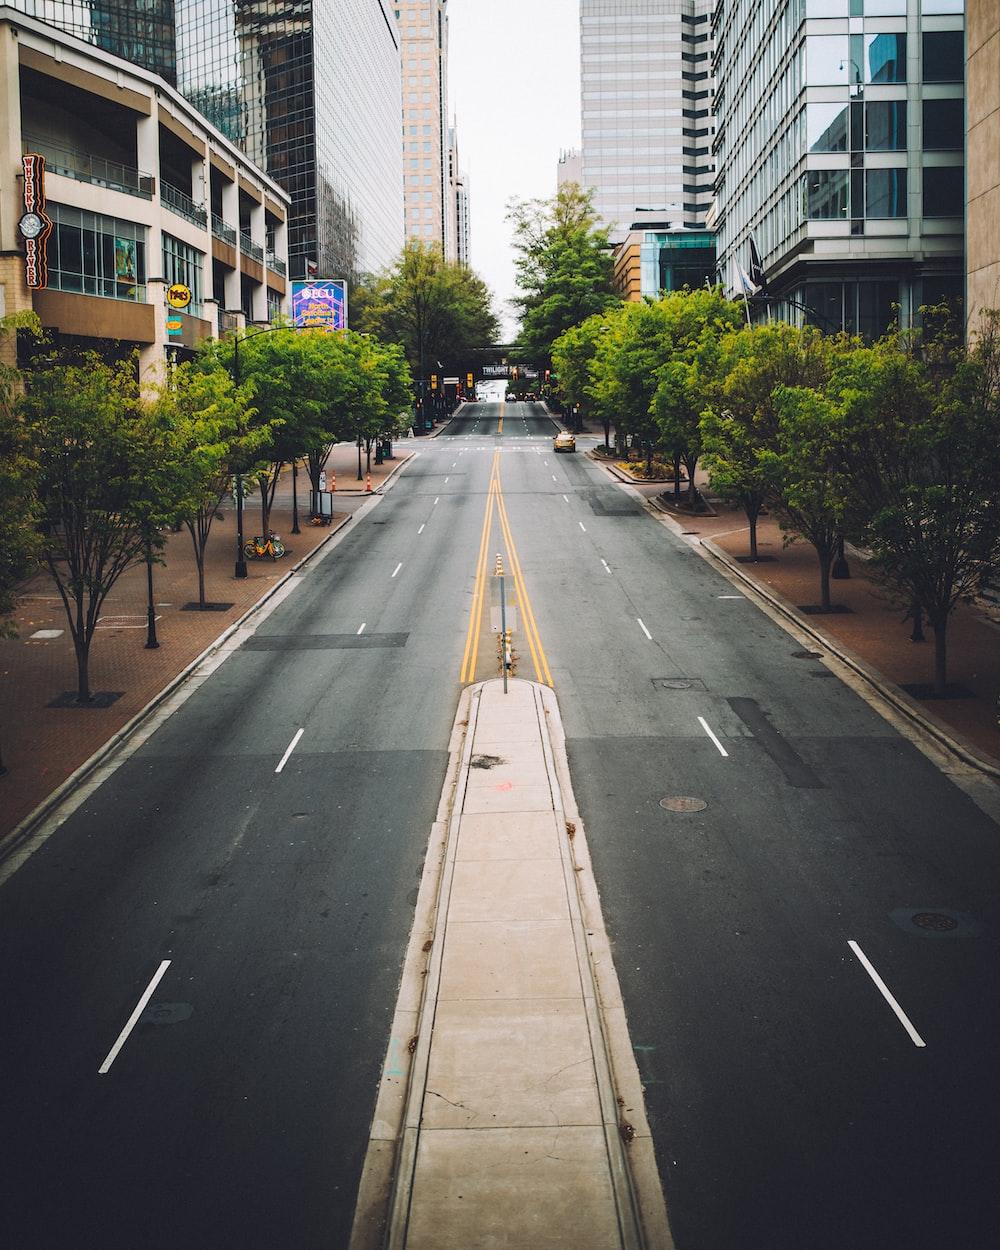 gray asphalt road between high rise buildings during daytime